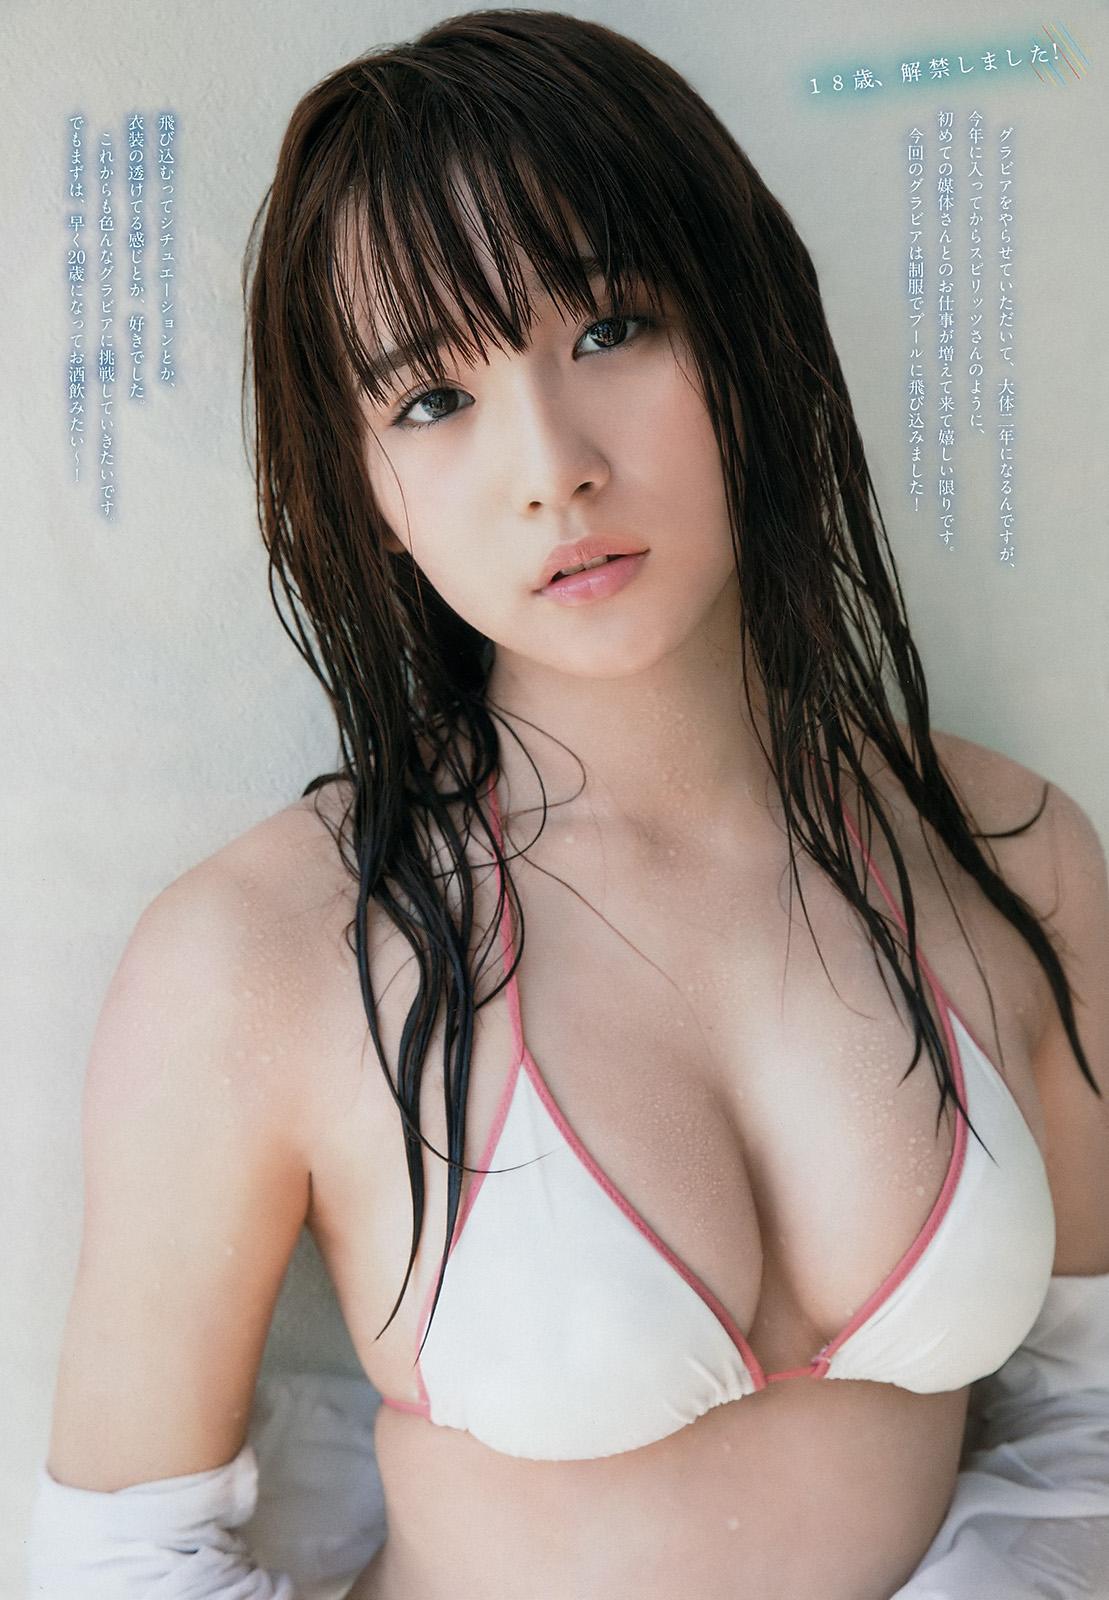 Asakawa Nana 浅川梨奈, Big Comic Spirits 2017 No.35 (週刊スピリッツ 2017年35号)